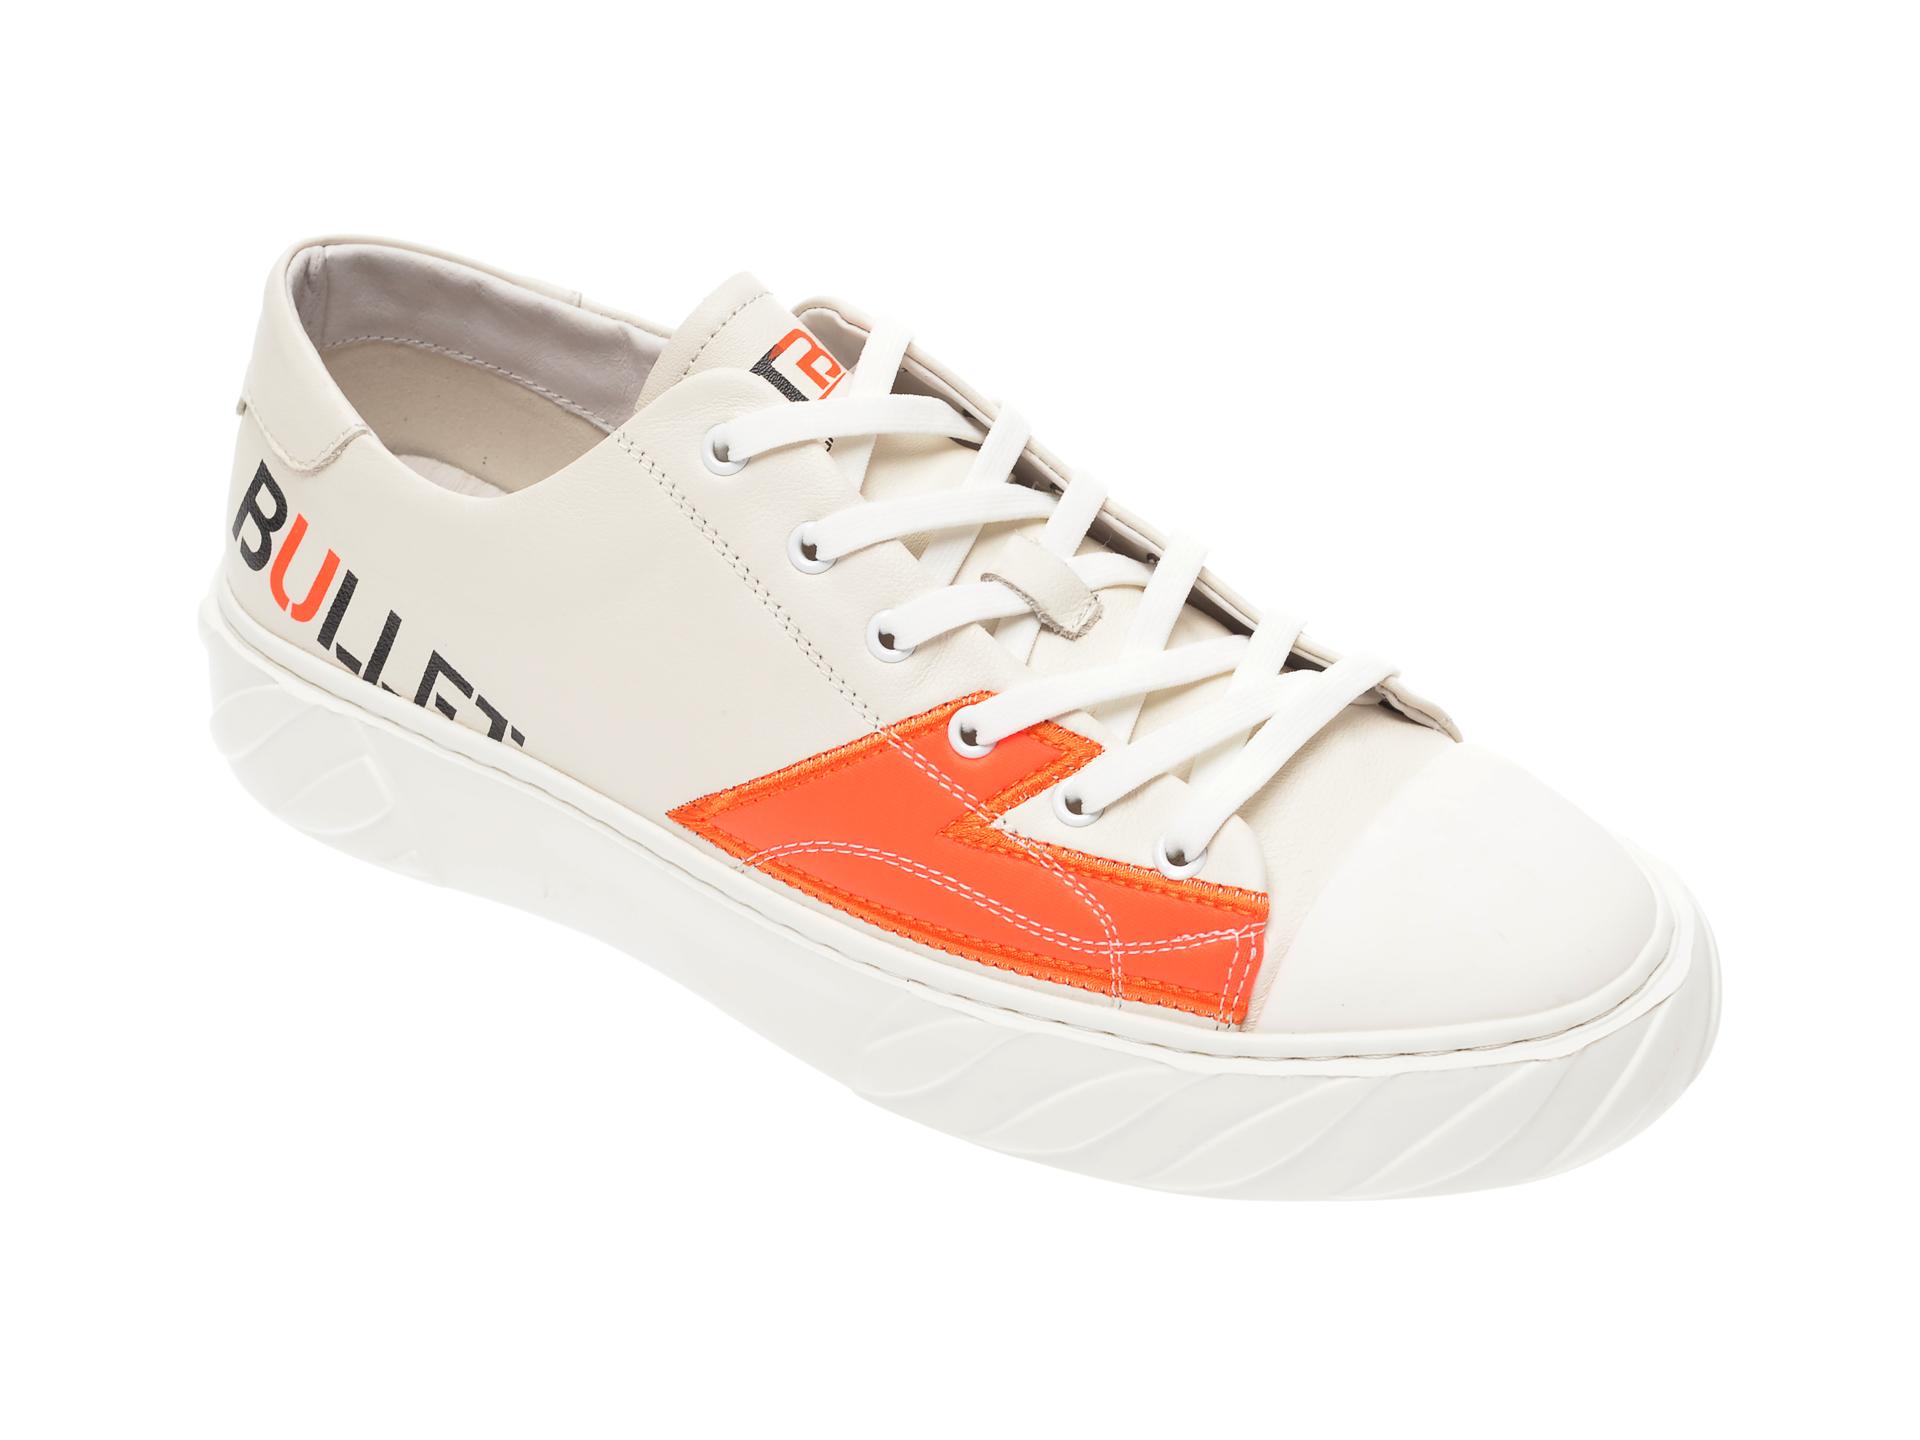 Pantofi BITE THE BULLET albi, 9669292, din piele naturala imagine